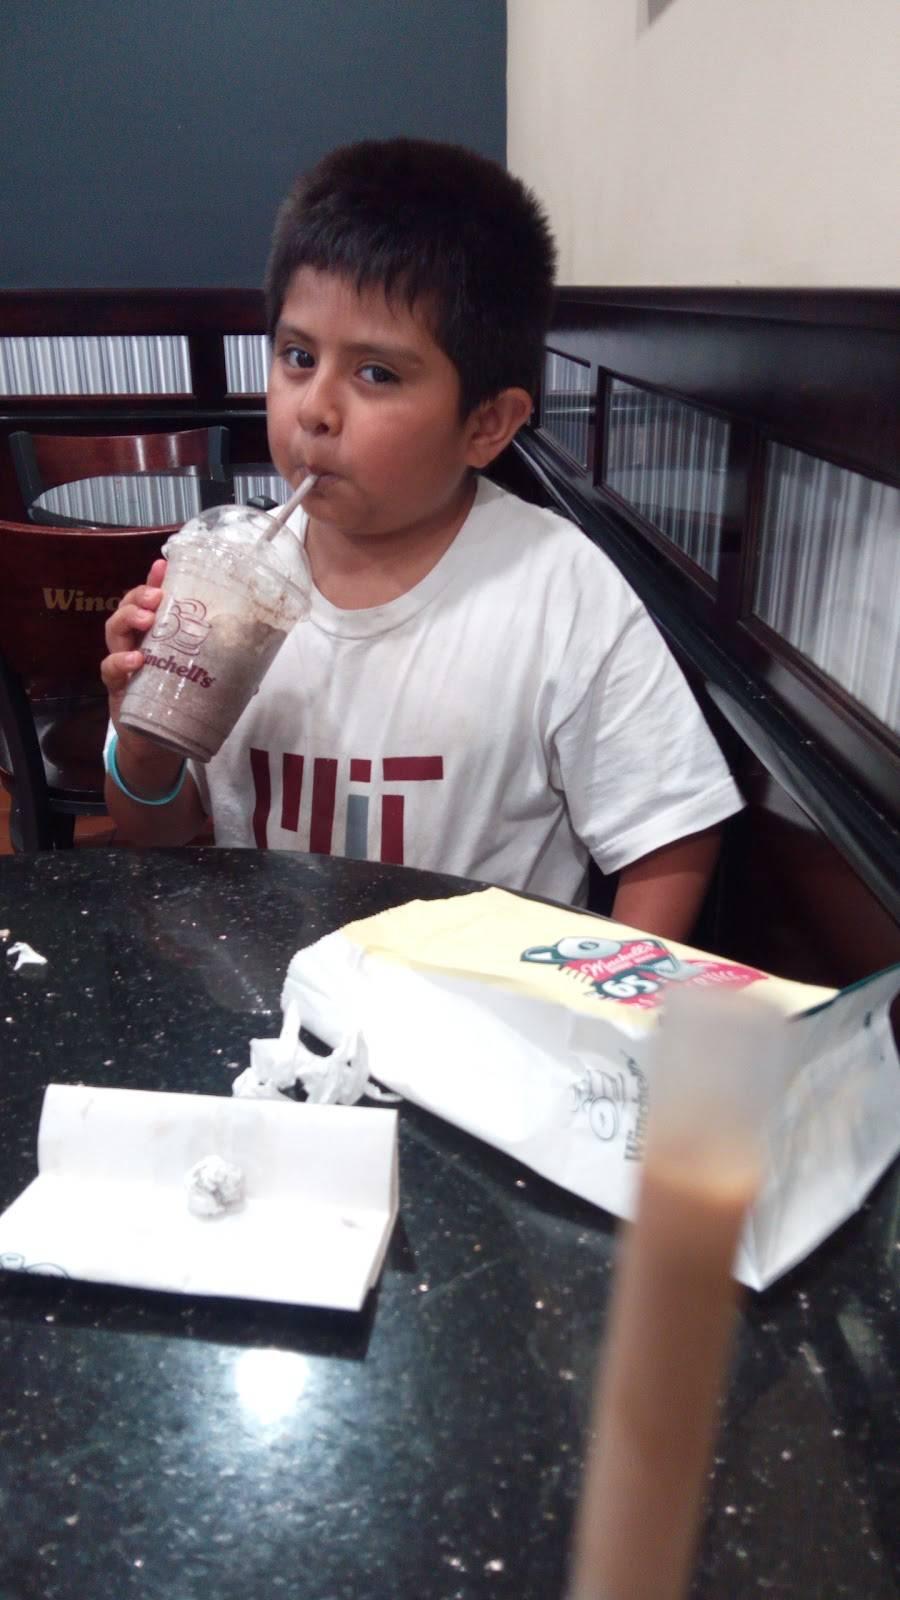 Winchells Donut House | cafe | 901 S Euclid St, Anaheim, CA 92802, USA | 7147741885 OR +1 714-774-1885